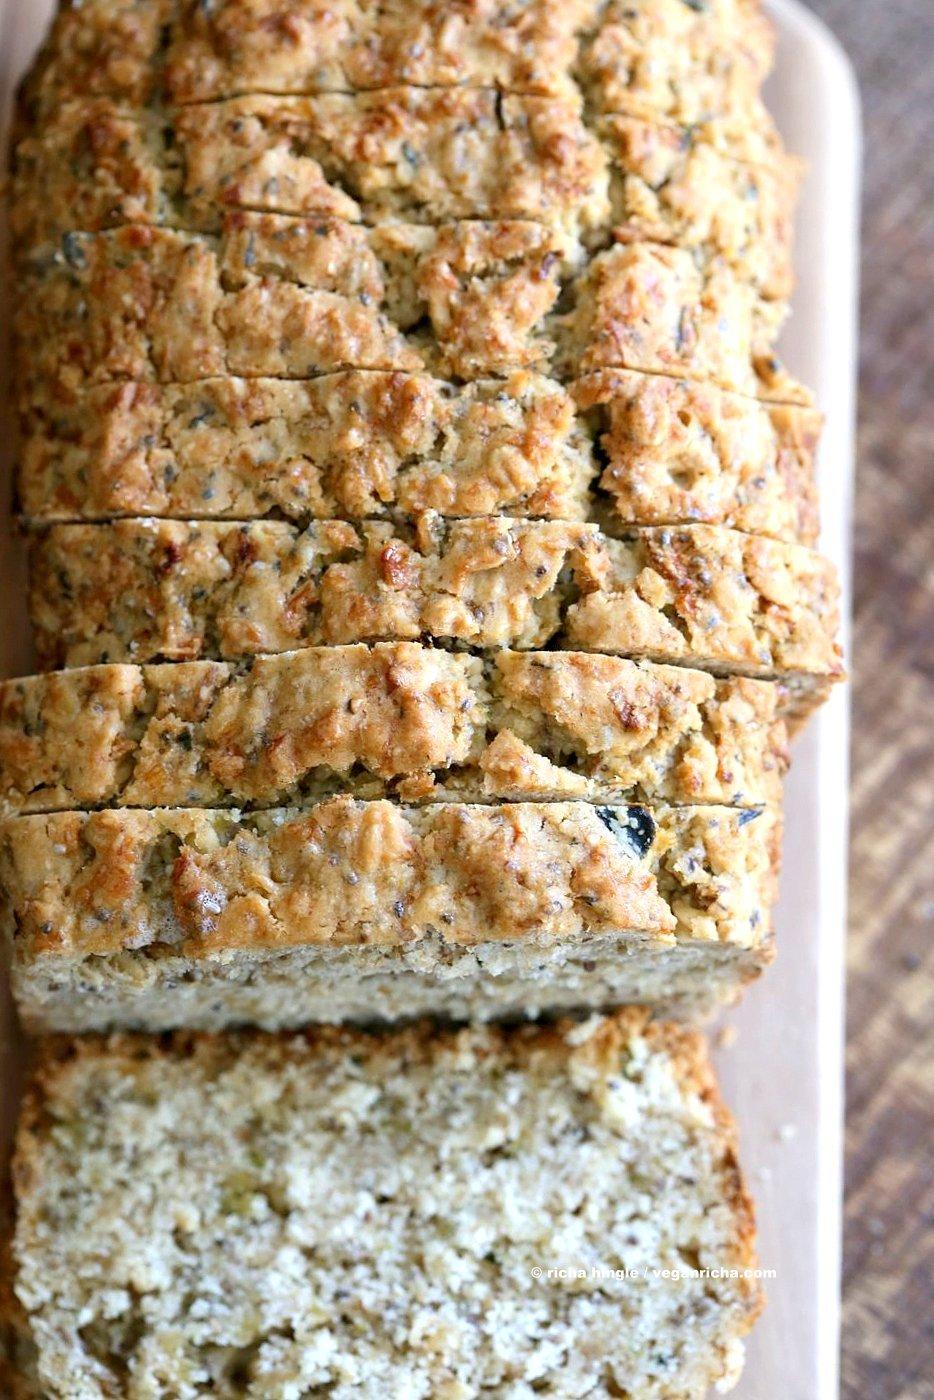 Vegan Gluten Free Zucchini Bread Recipe Vegan Richa